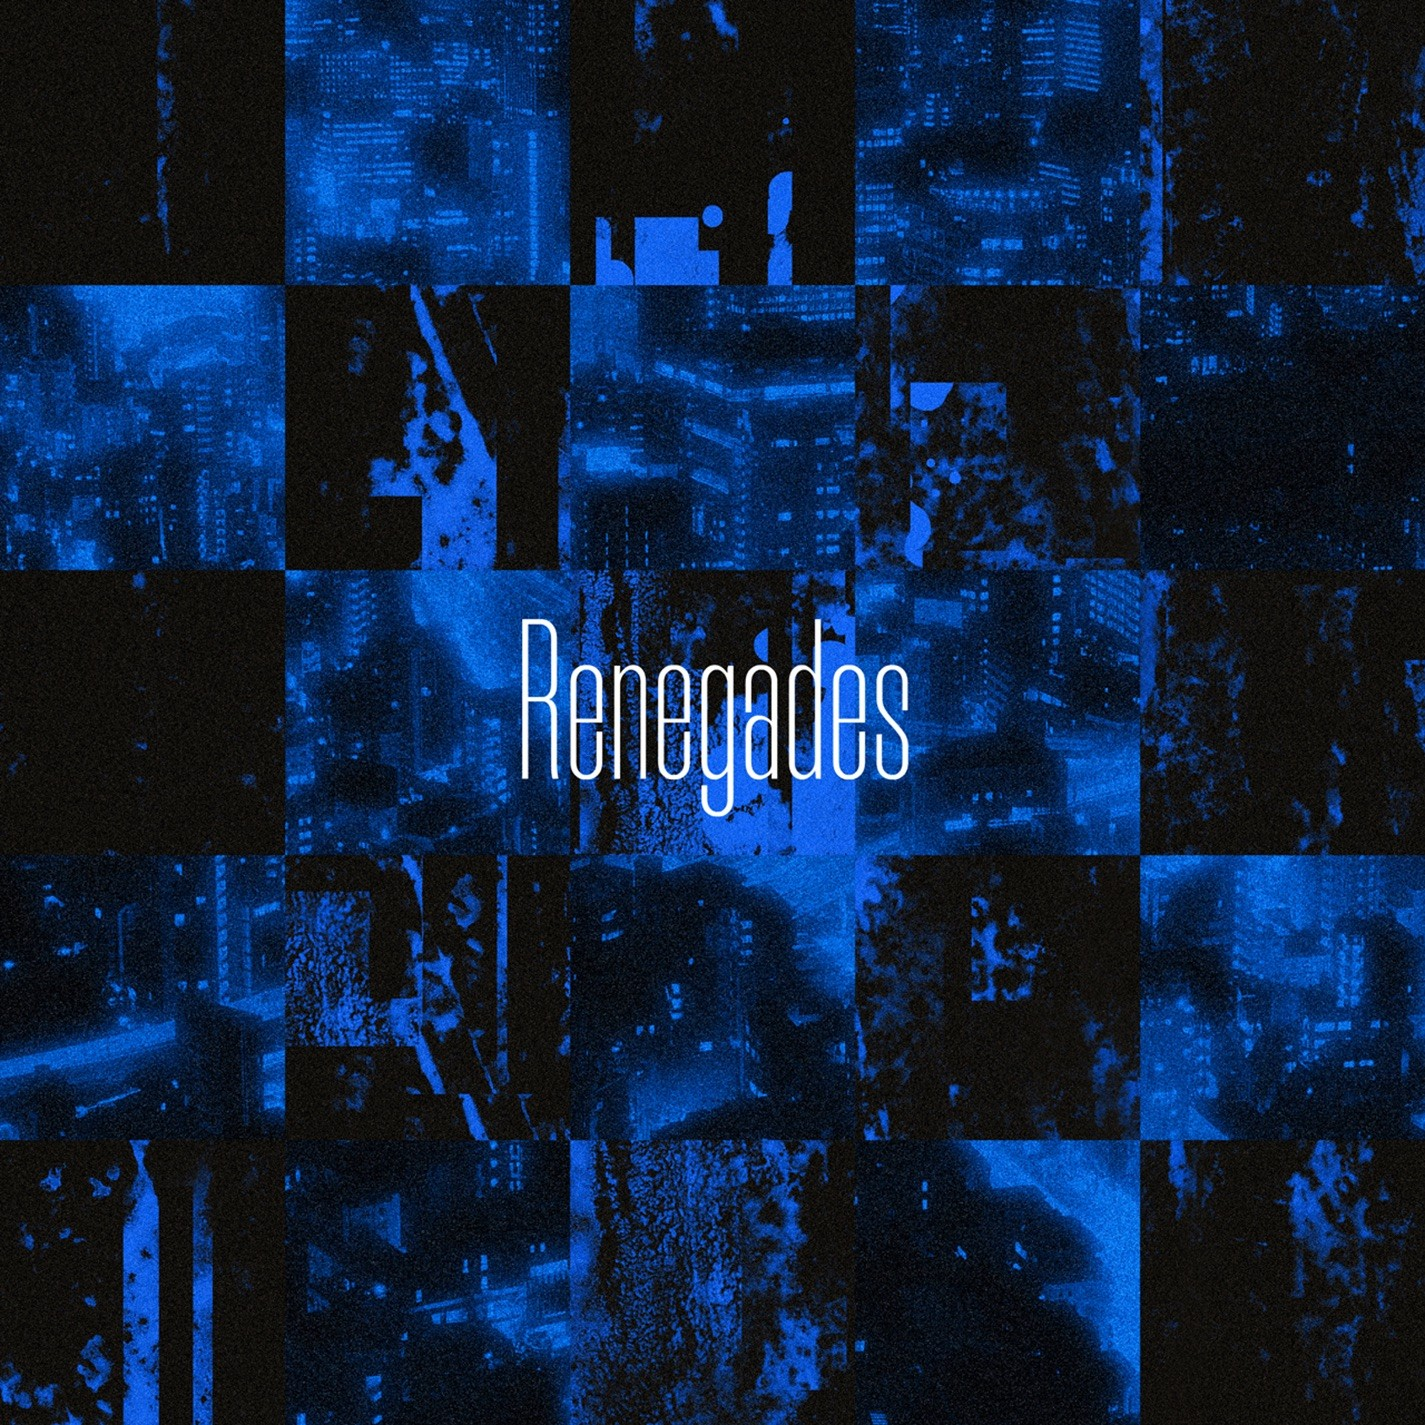 ONE OK ROCK – Renegades (Acoustic version) [FLAC / 24bit Lossless / WEB] [2021.07.30]